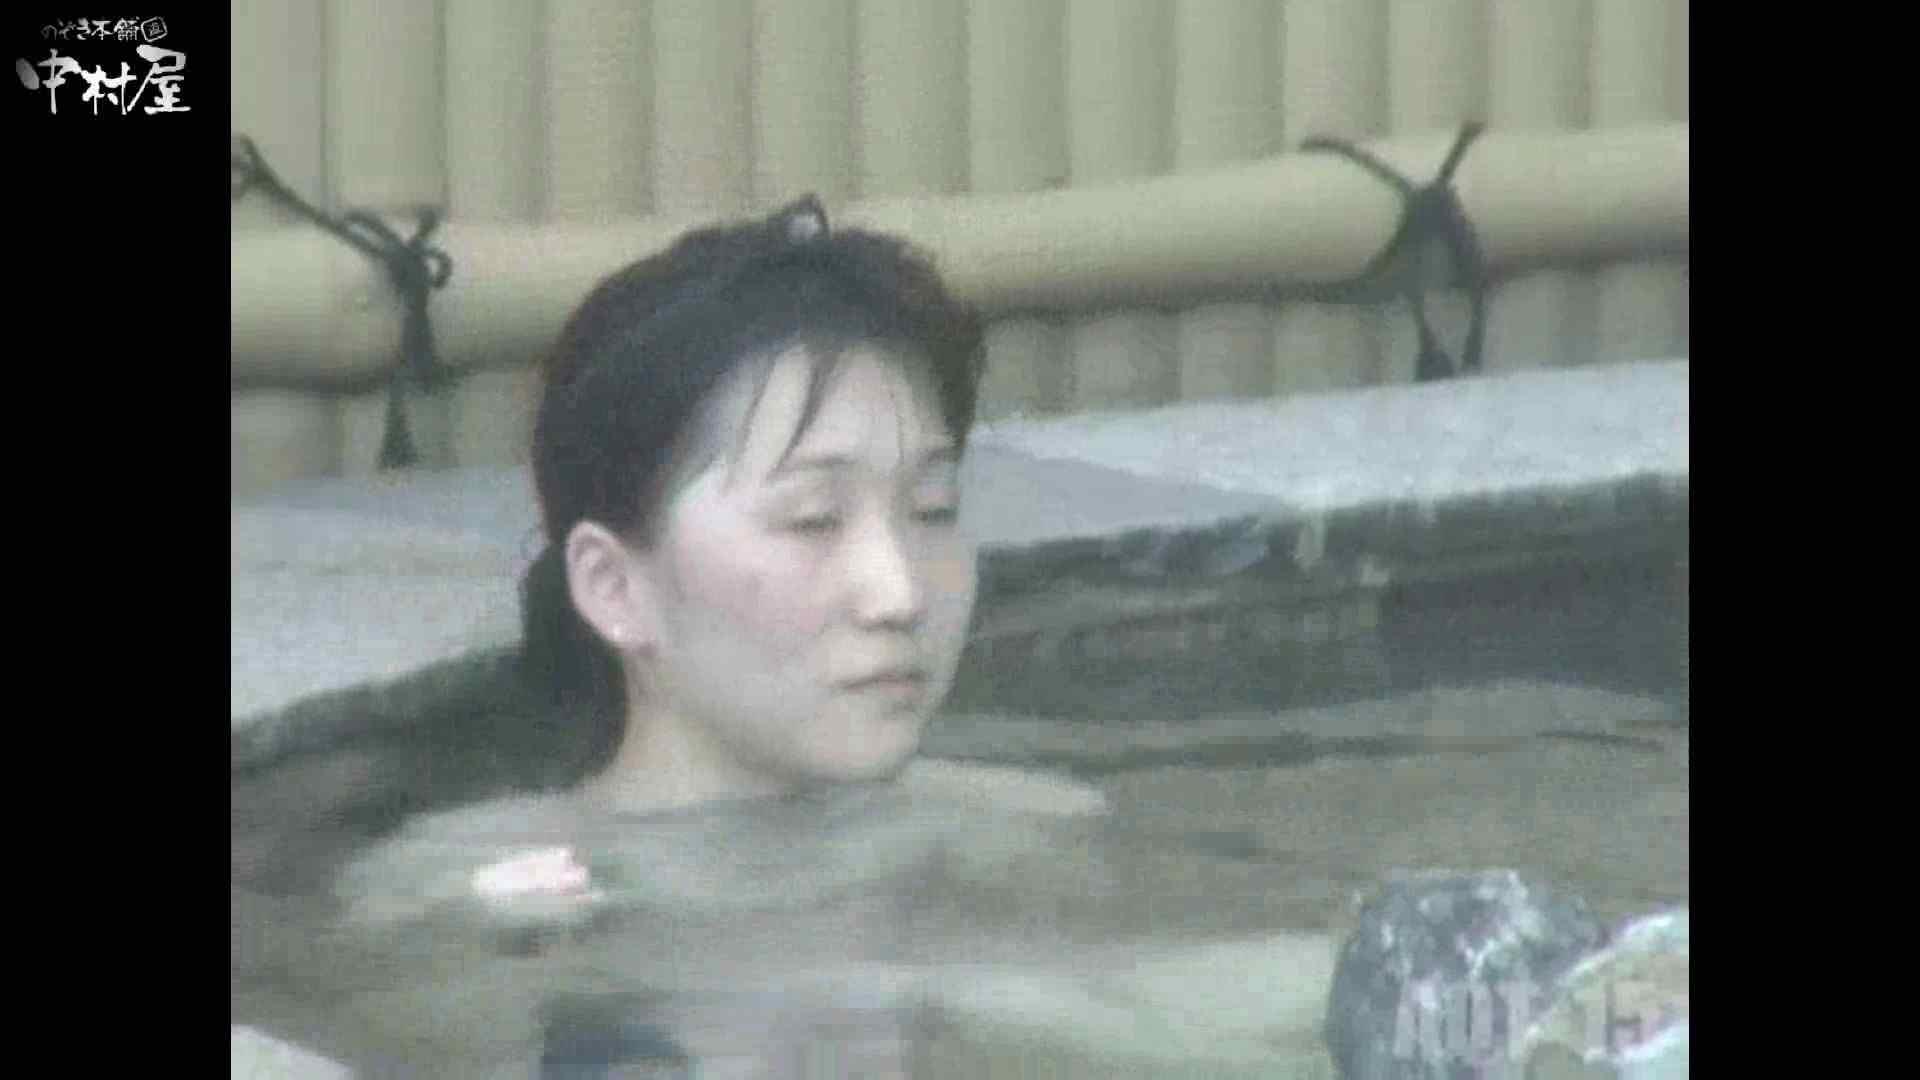 Aquaな露天風呂Vol.878潜入盗撮露天風呂十五判湯 其の一 露天風呂突入 | 美しいOLの裸体  74pic 65